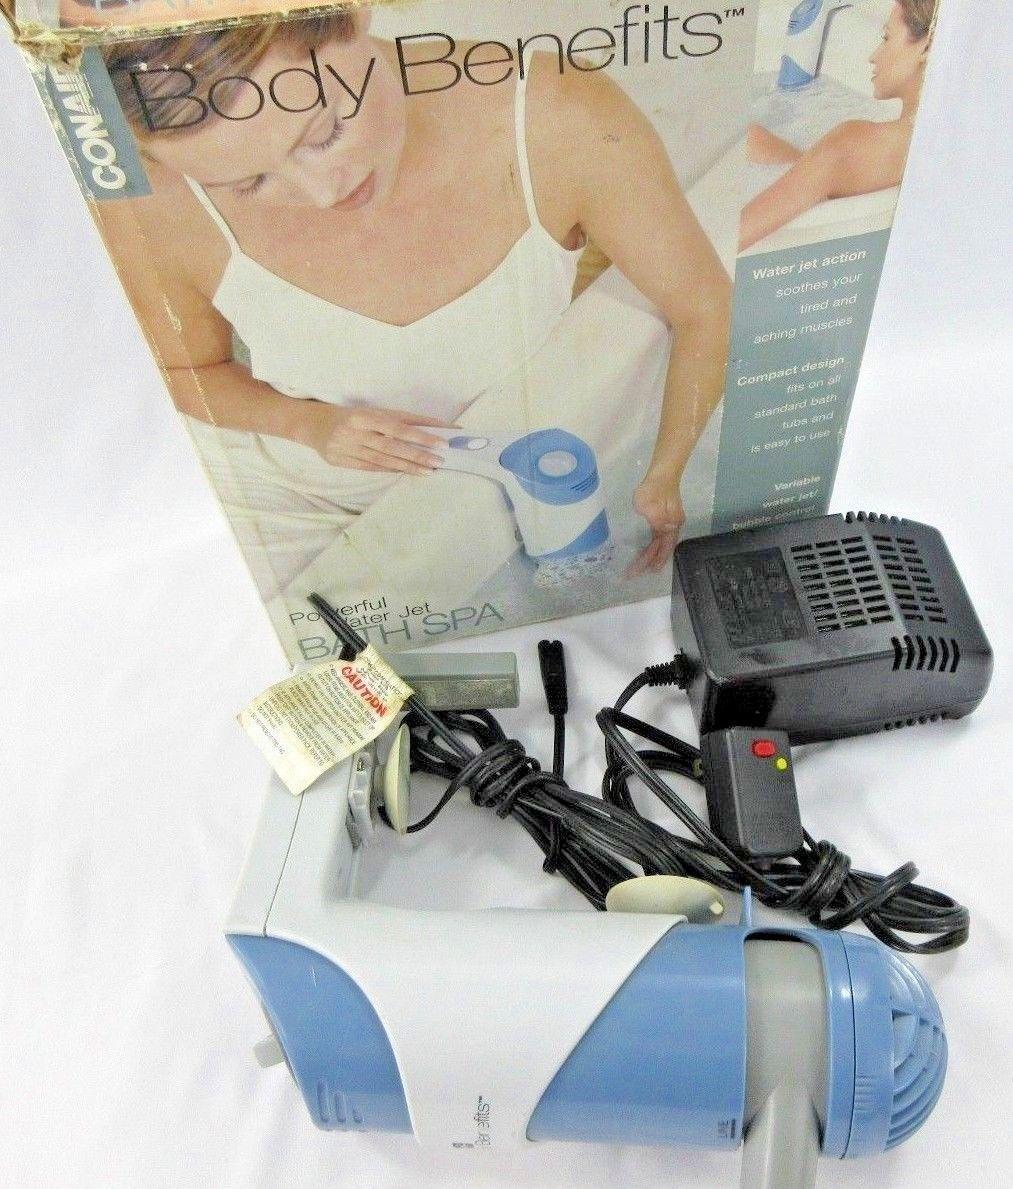 Conair Body Benefits Bath Spa Powerful Water and similar items